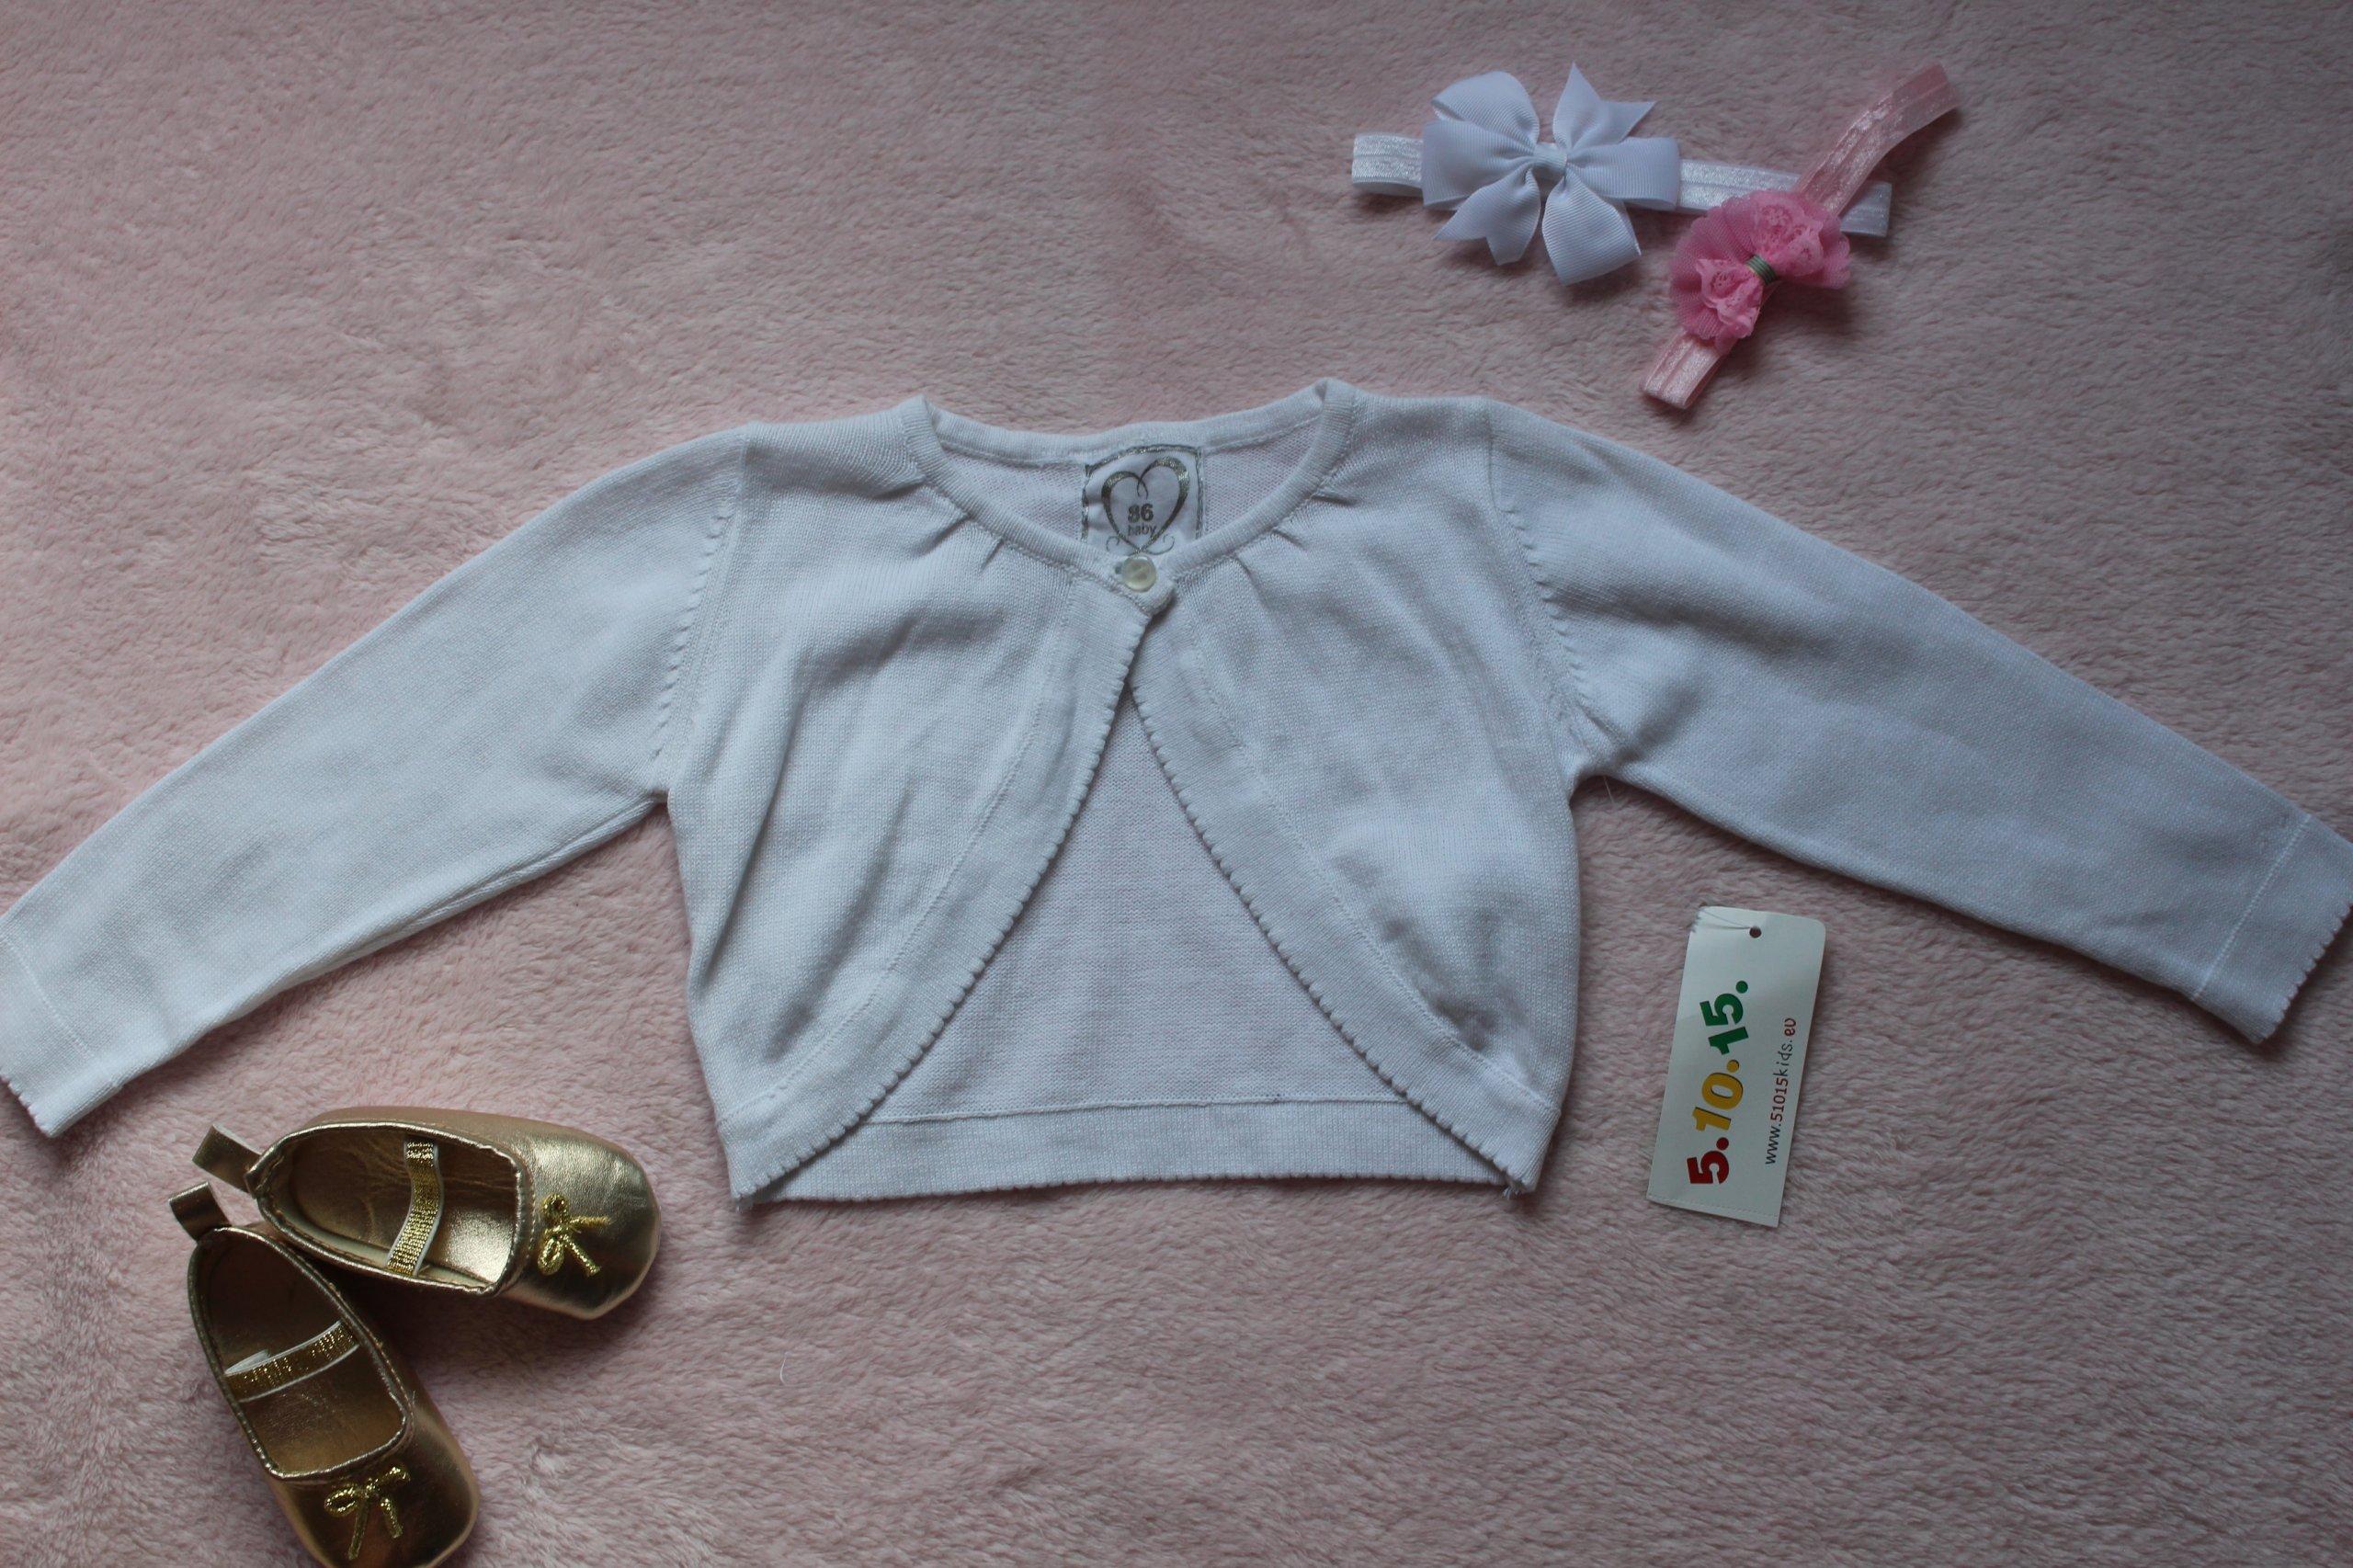 nowe 62 bolerko  5.10.15.  ŚLICZNE sweterek